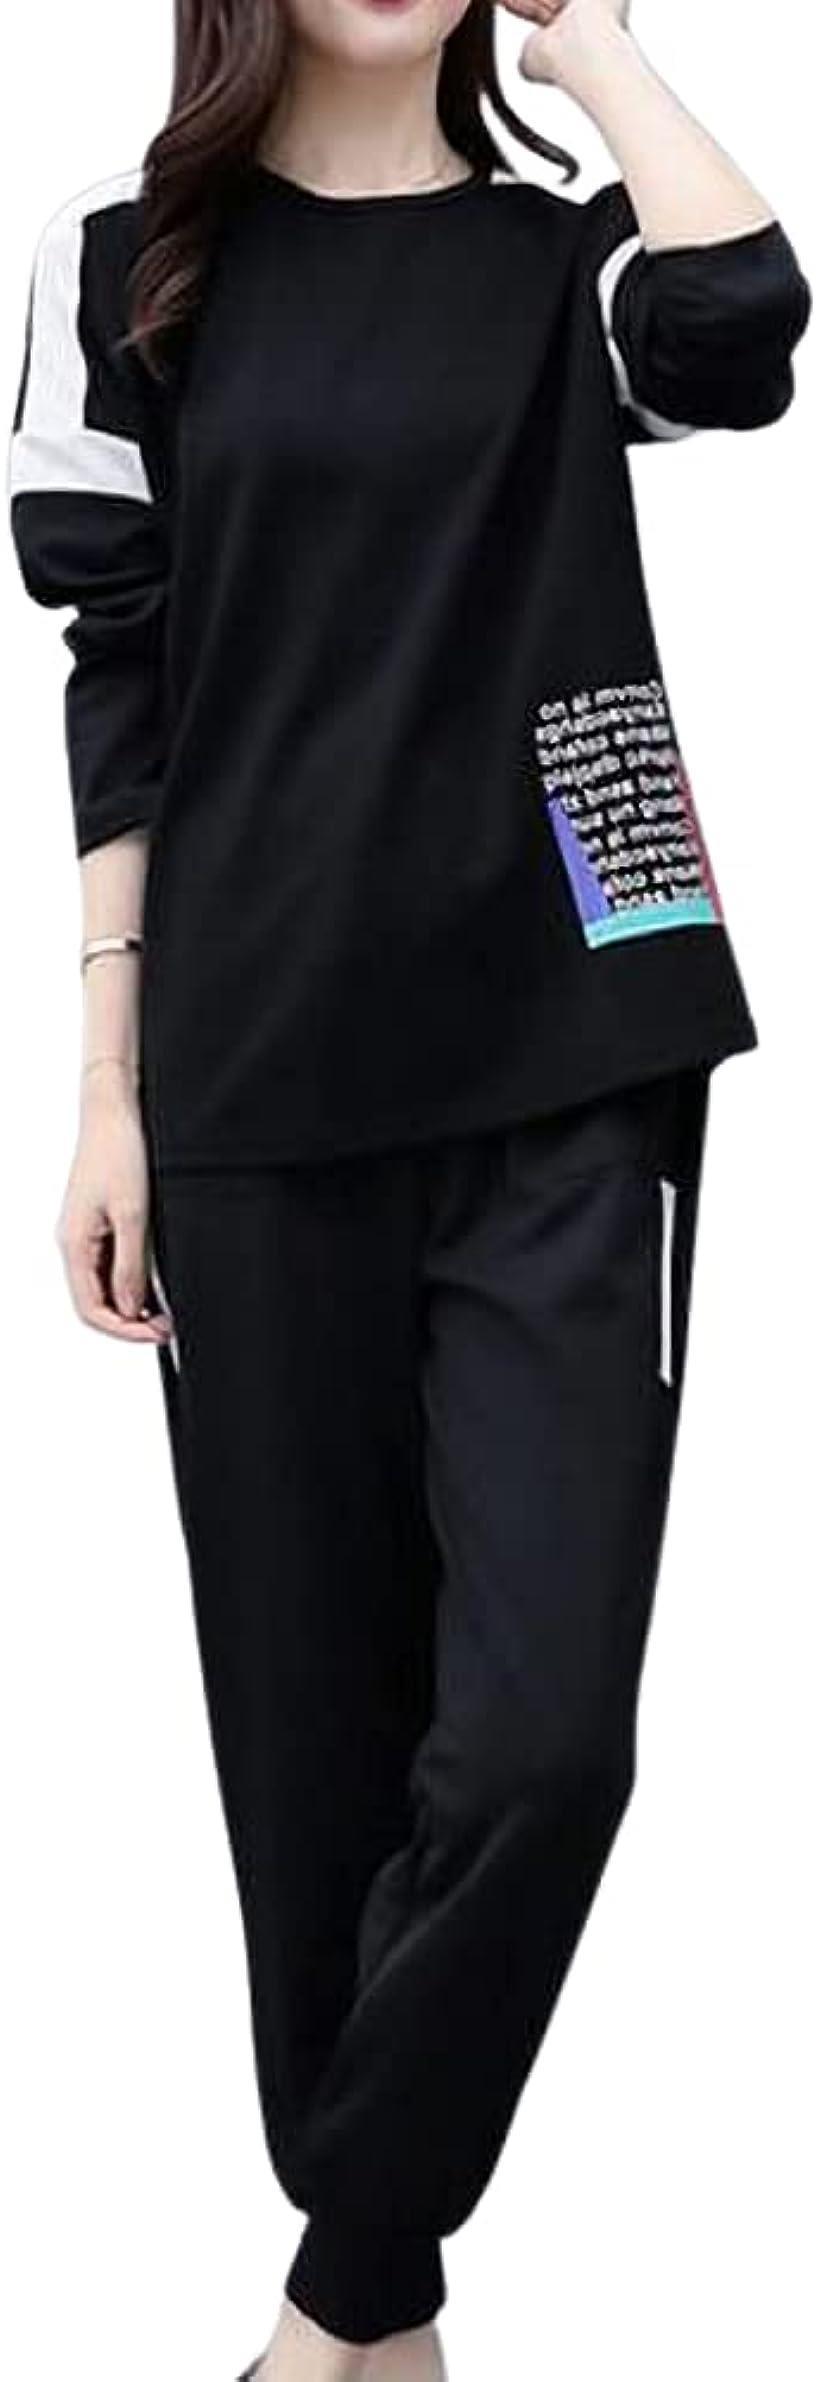 emptio タイムセール エンプティオ 長袖 オシャレ 贈物 上下セット スエット ブラック パンツ レディ―ス S #ブラック セットアップ